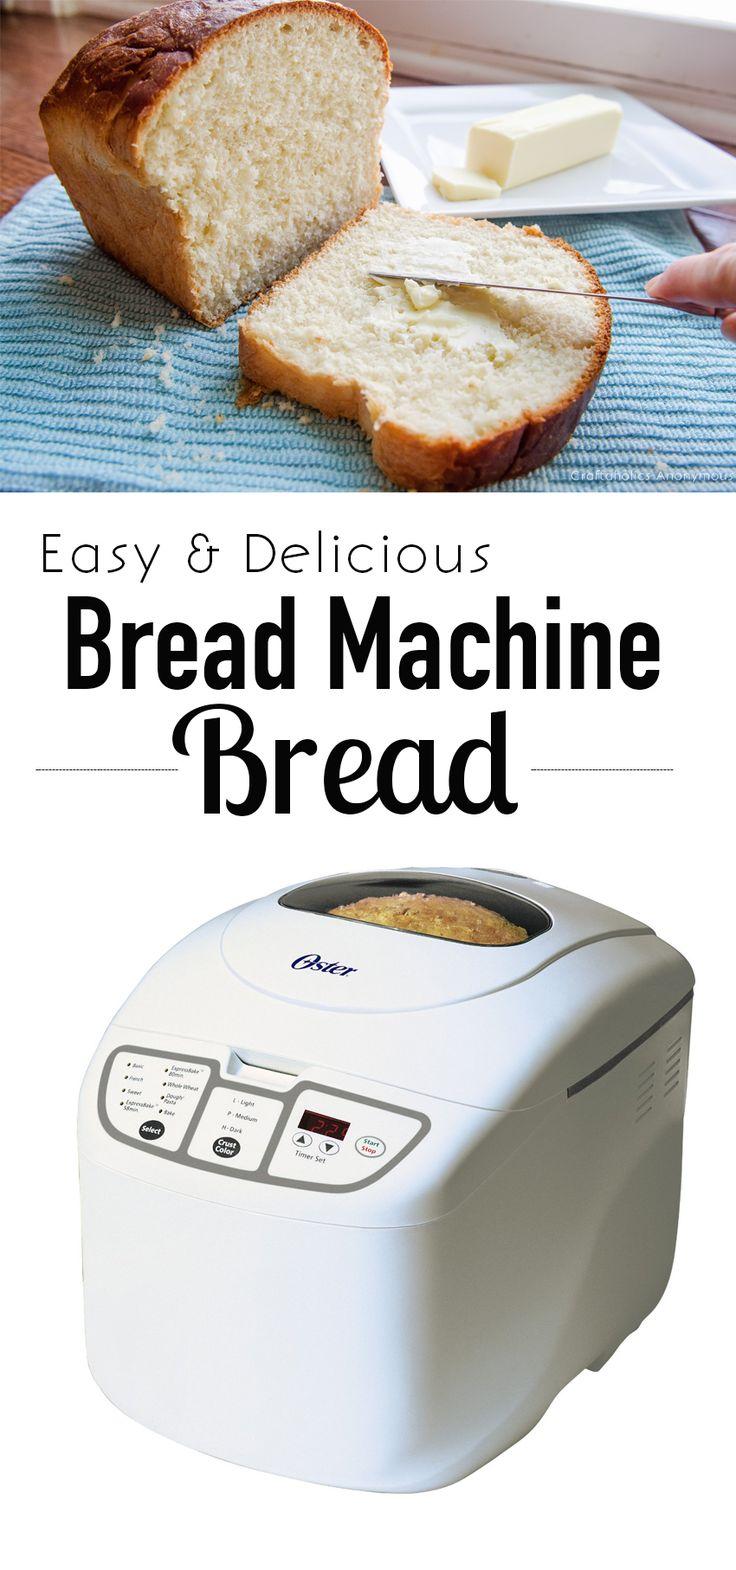 The most Delicious Bread Machine bread recipe ever! Get homemade bread the easy way.